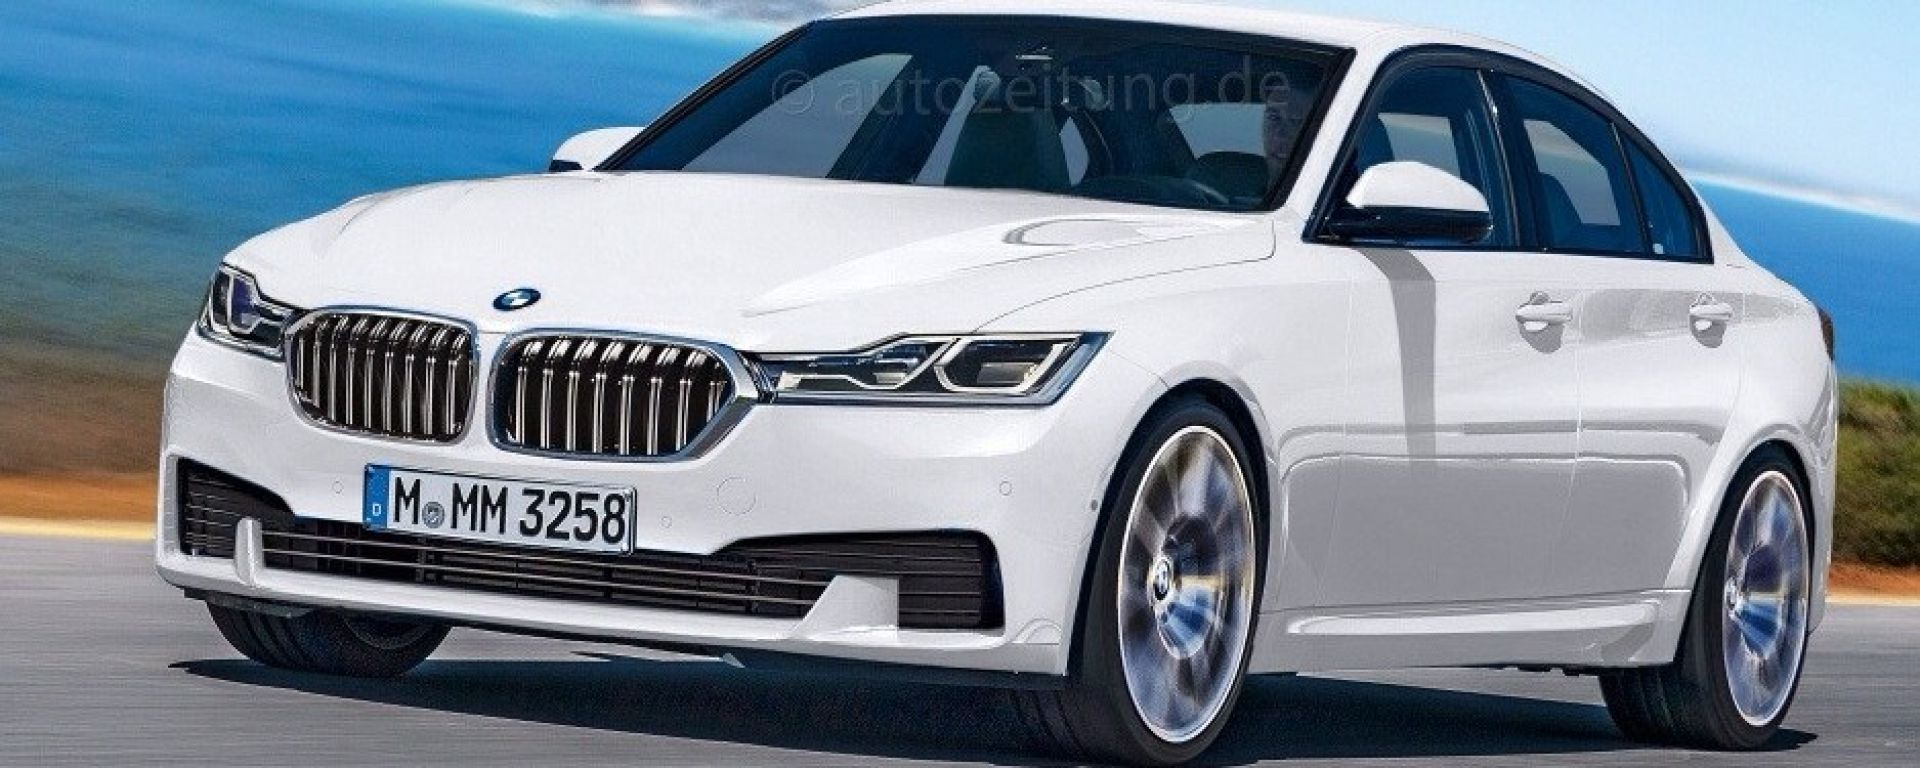 Bmw Serie 3 G20 >> Nuova BMW Serie 3 G20: nel 2018 la berlina, poi la touring - MotorBox